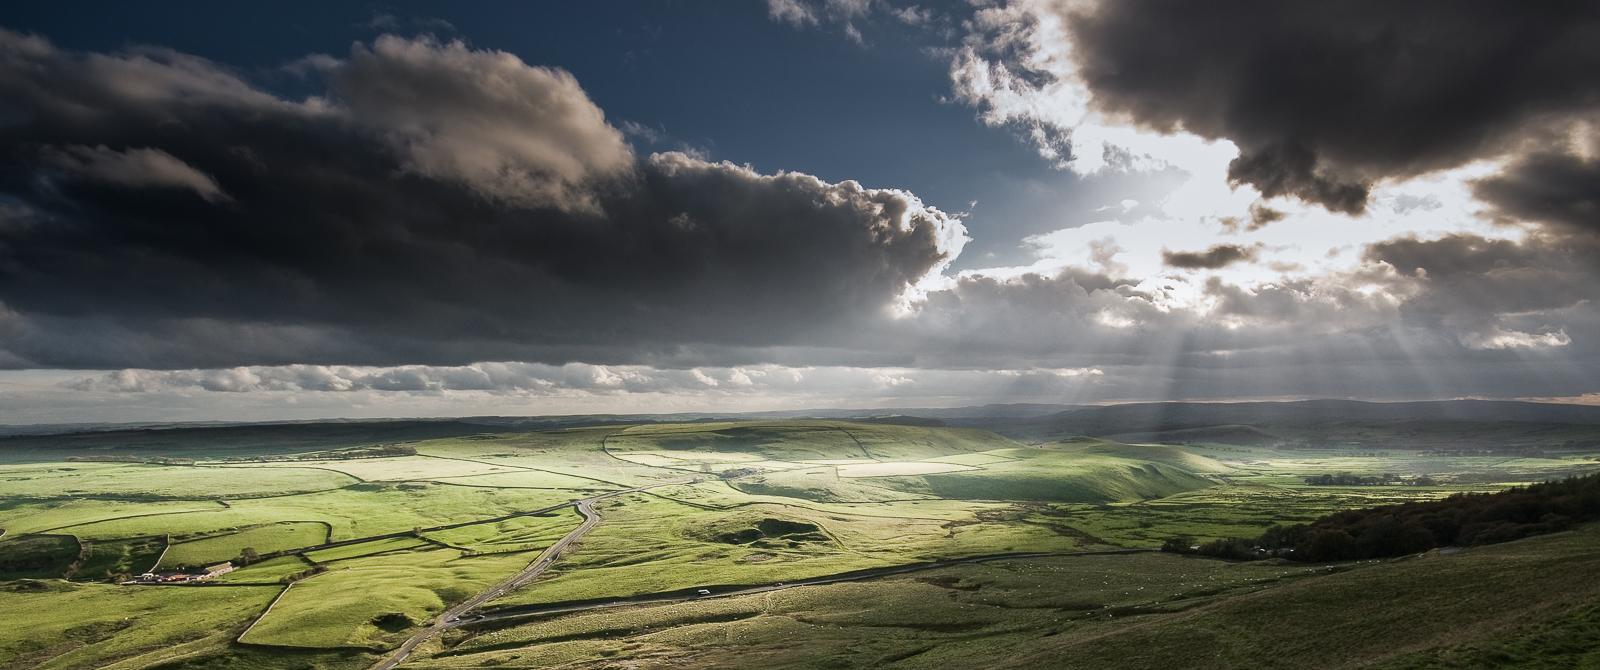 Peak District, England